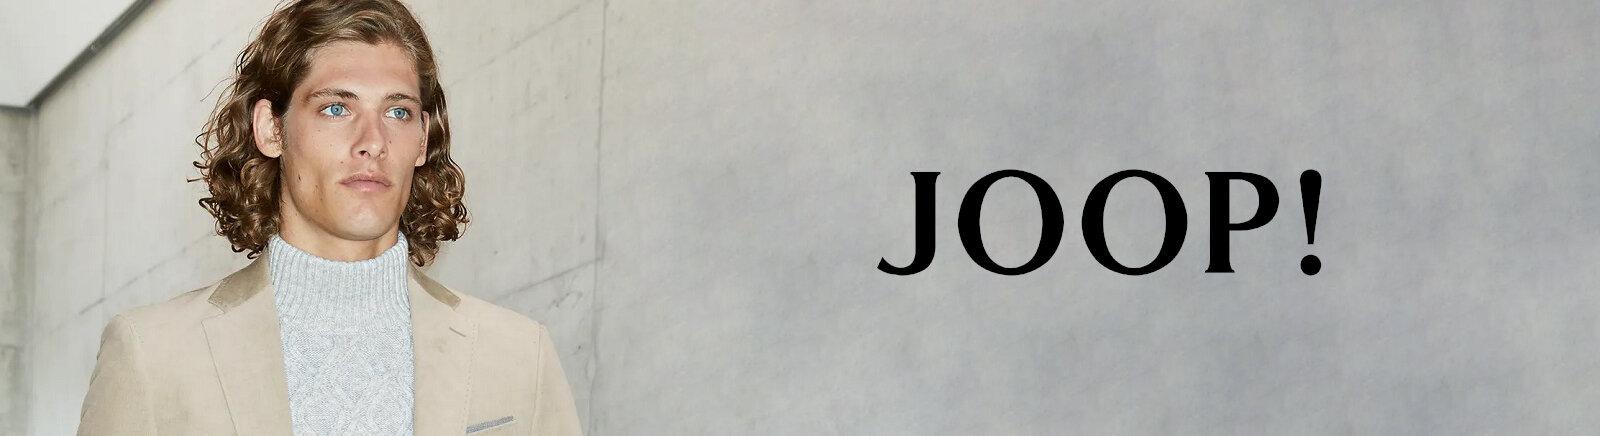 Joop Markenschuhe online bestellen im Prange Schuhe Shop